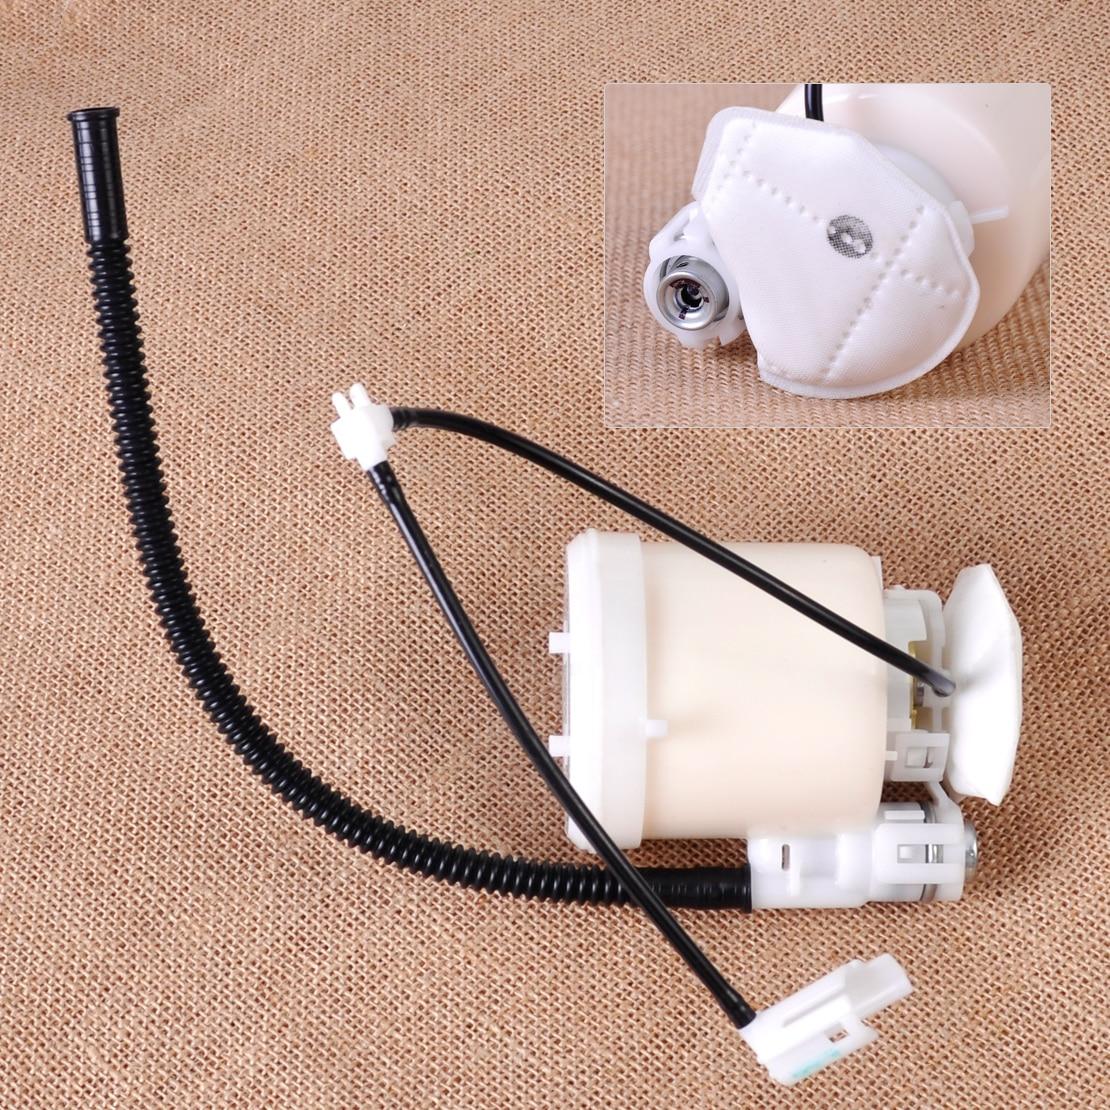 Citall Fuel Pump   Filter Assembly 950 0203 E3000 174819